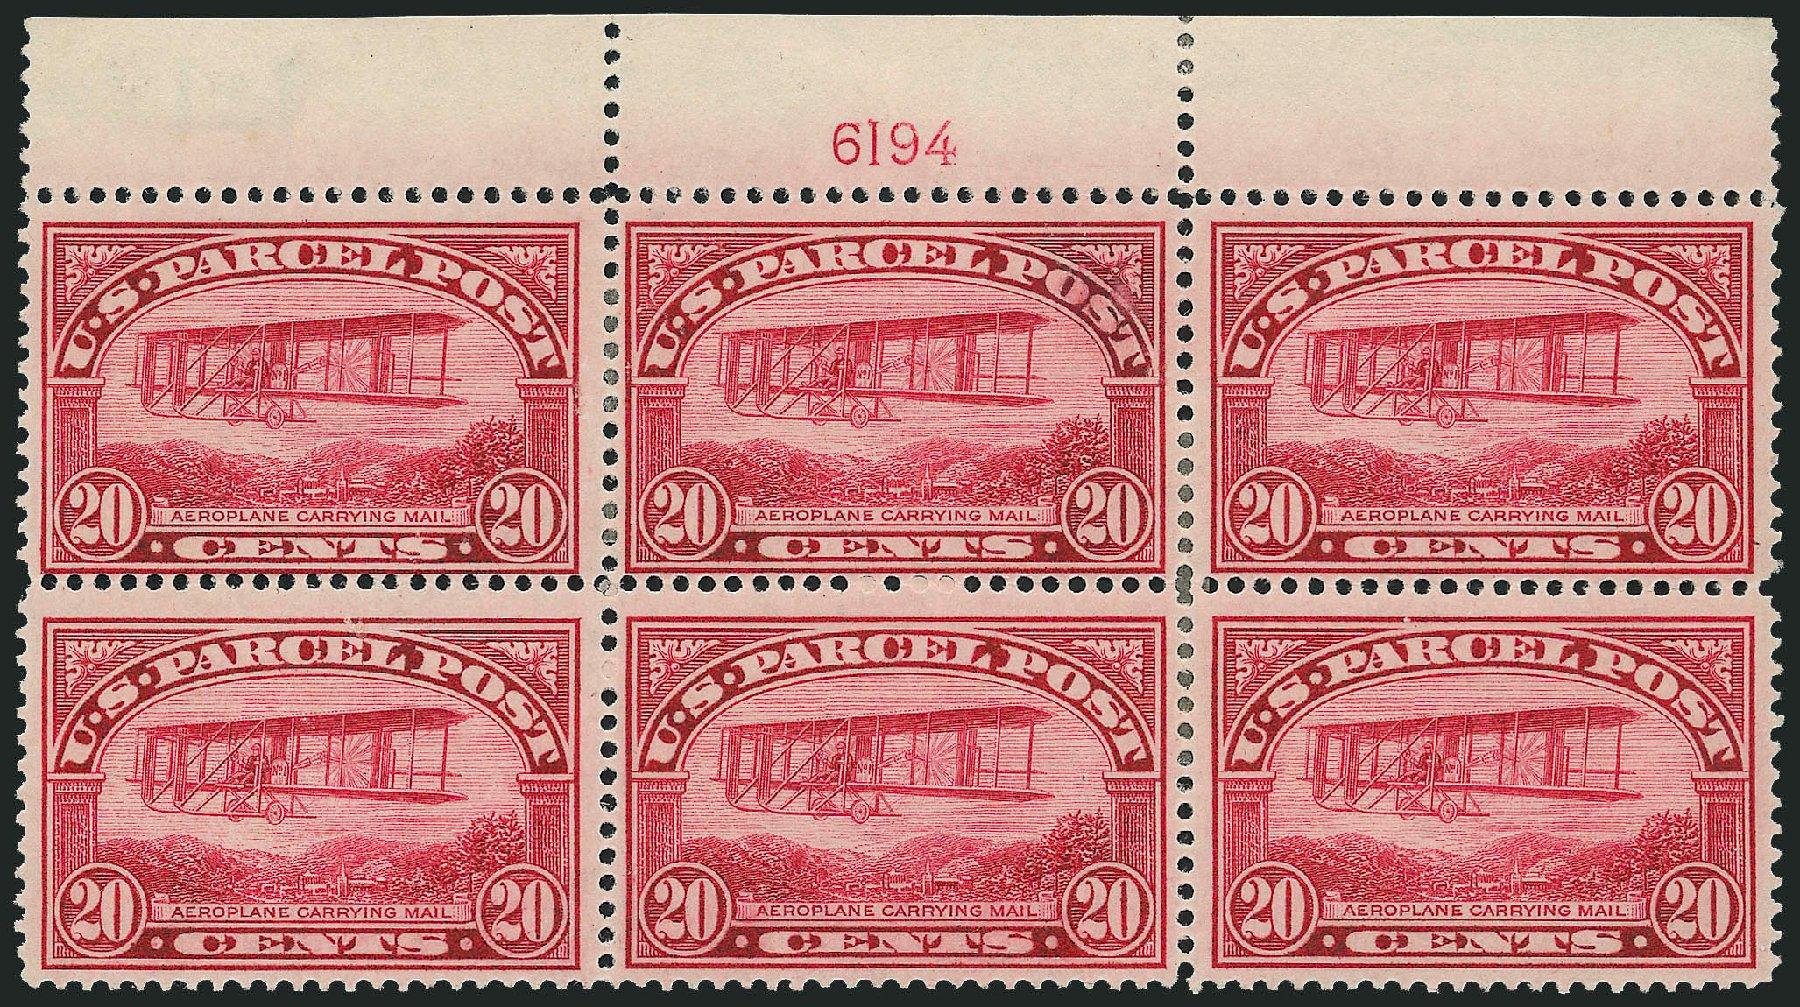 Price of US Stamps Scott Catalog #Q8: 1913 20c Parcel Post. Robert Siegel Auction Galleries, Dec 2014, Sale 1090, Lot 1701